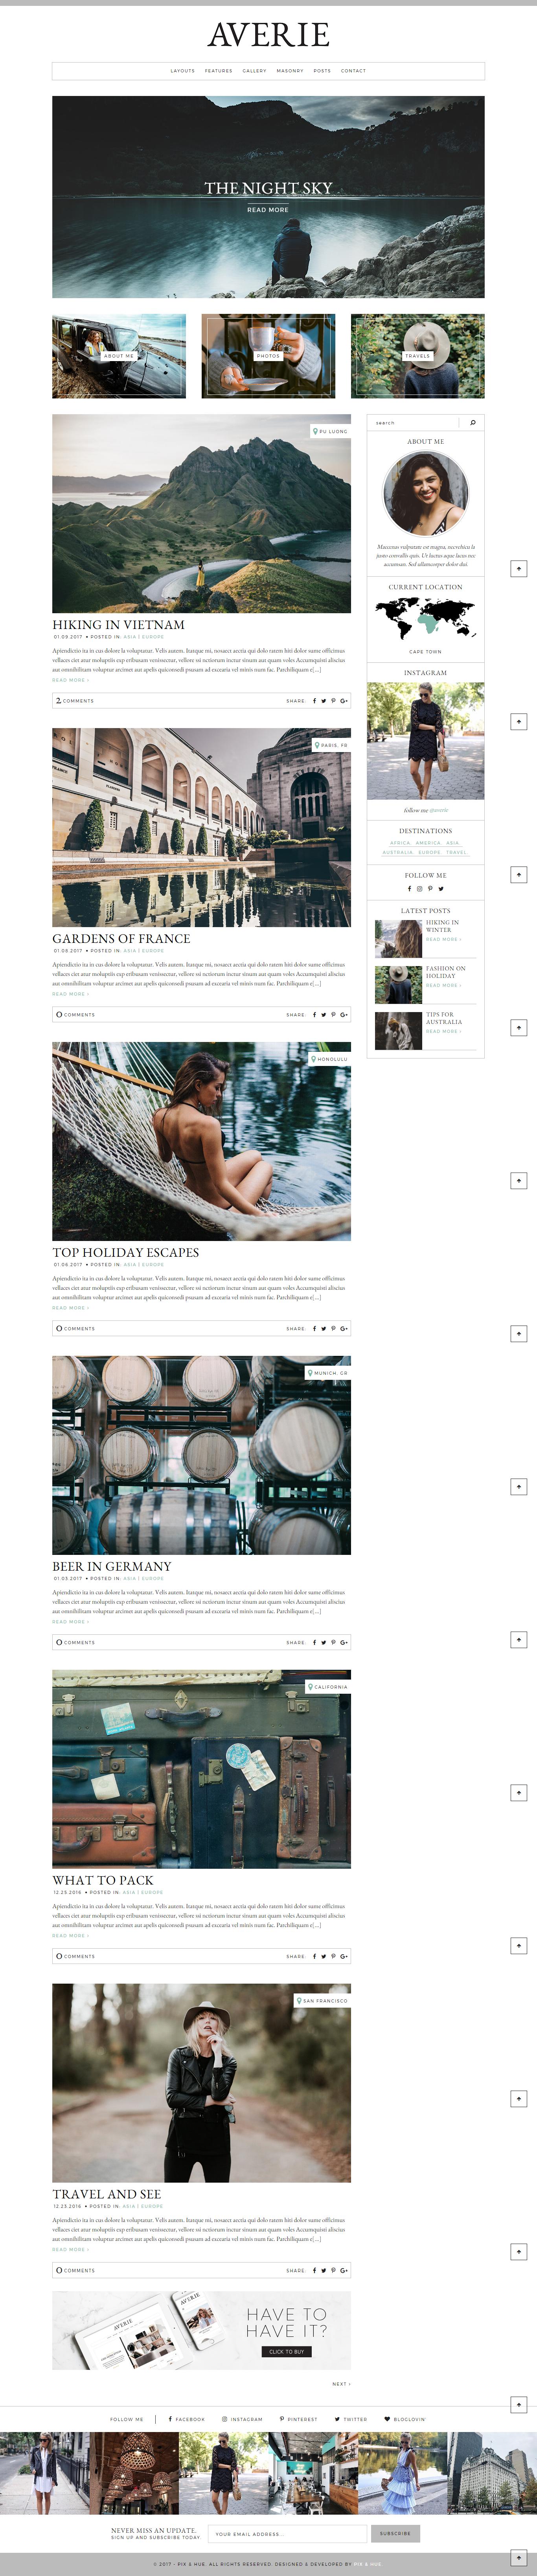 Averie - A Blog & Shop Theme